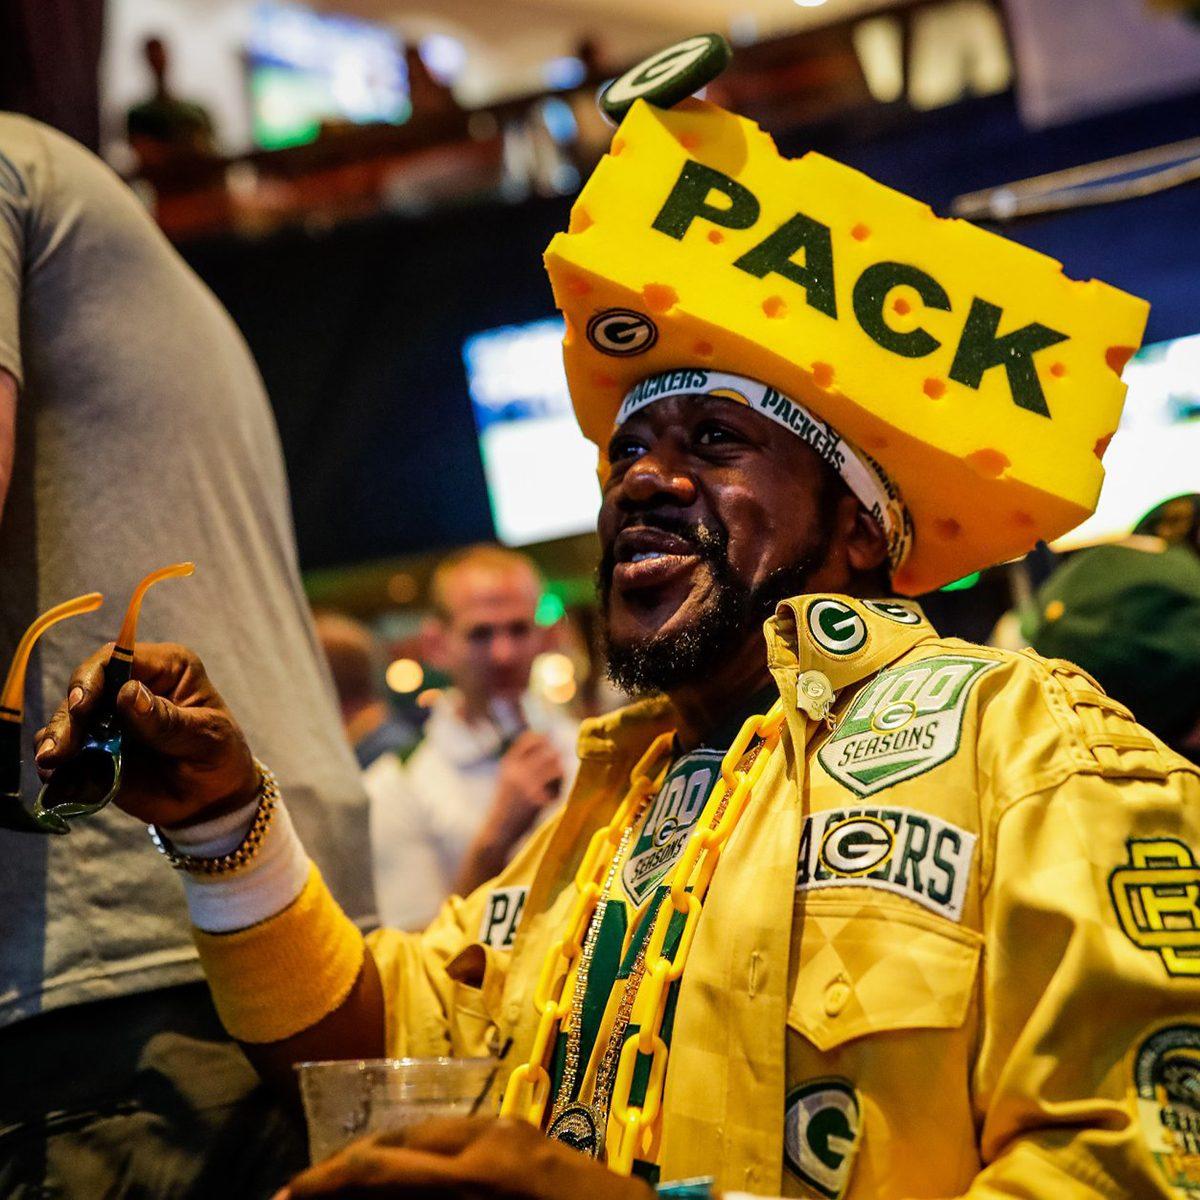 Green Bay Packer fan all decked out